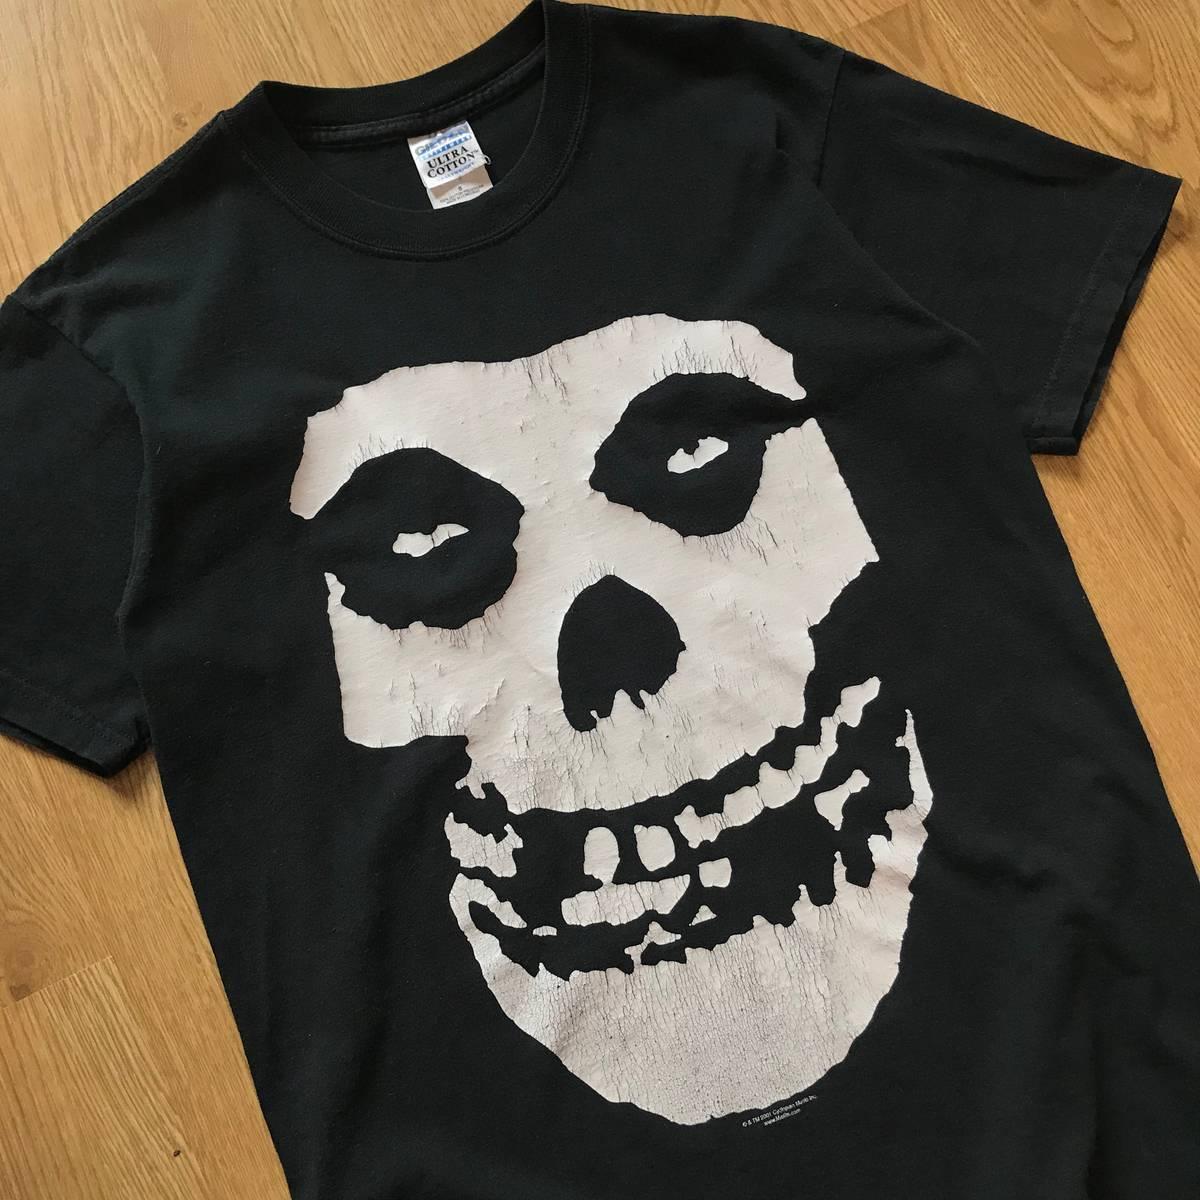 Black Flag Motorhead Social Distortion W 23.5 x L 30 Vintage 90/'s Misfits Can/'t Hold Back The Demons T Shirt size XL